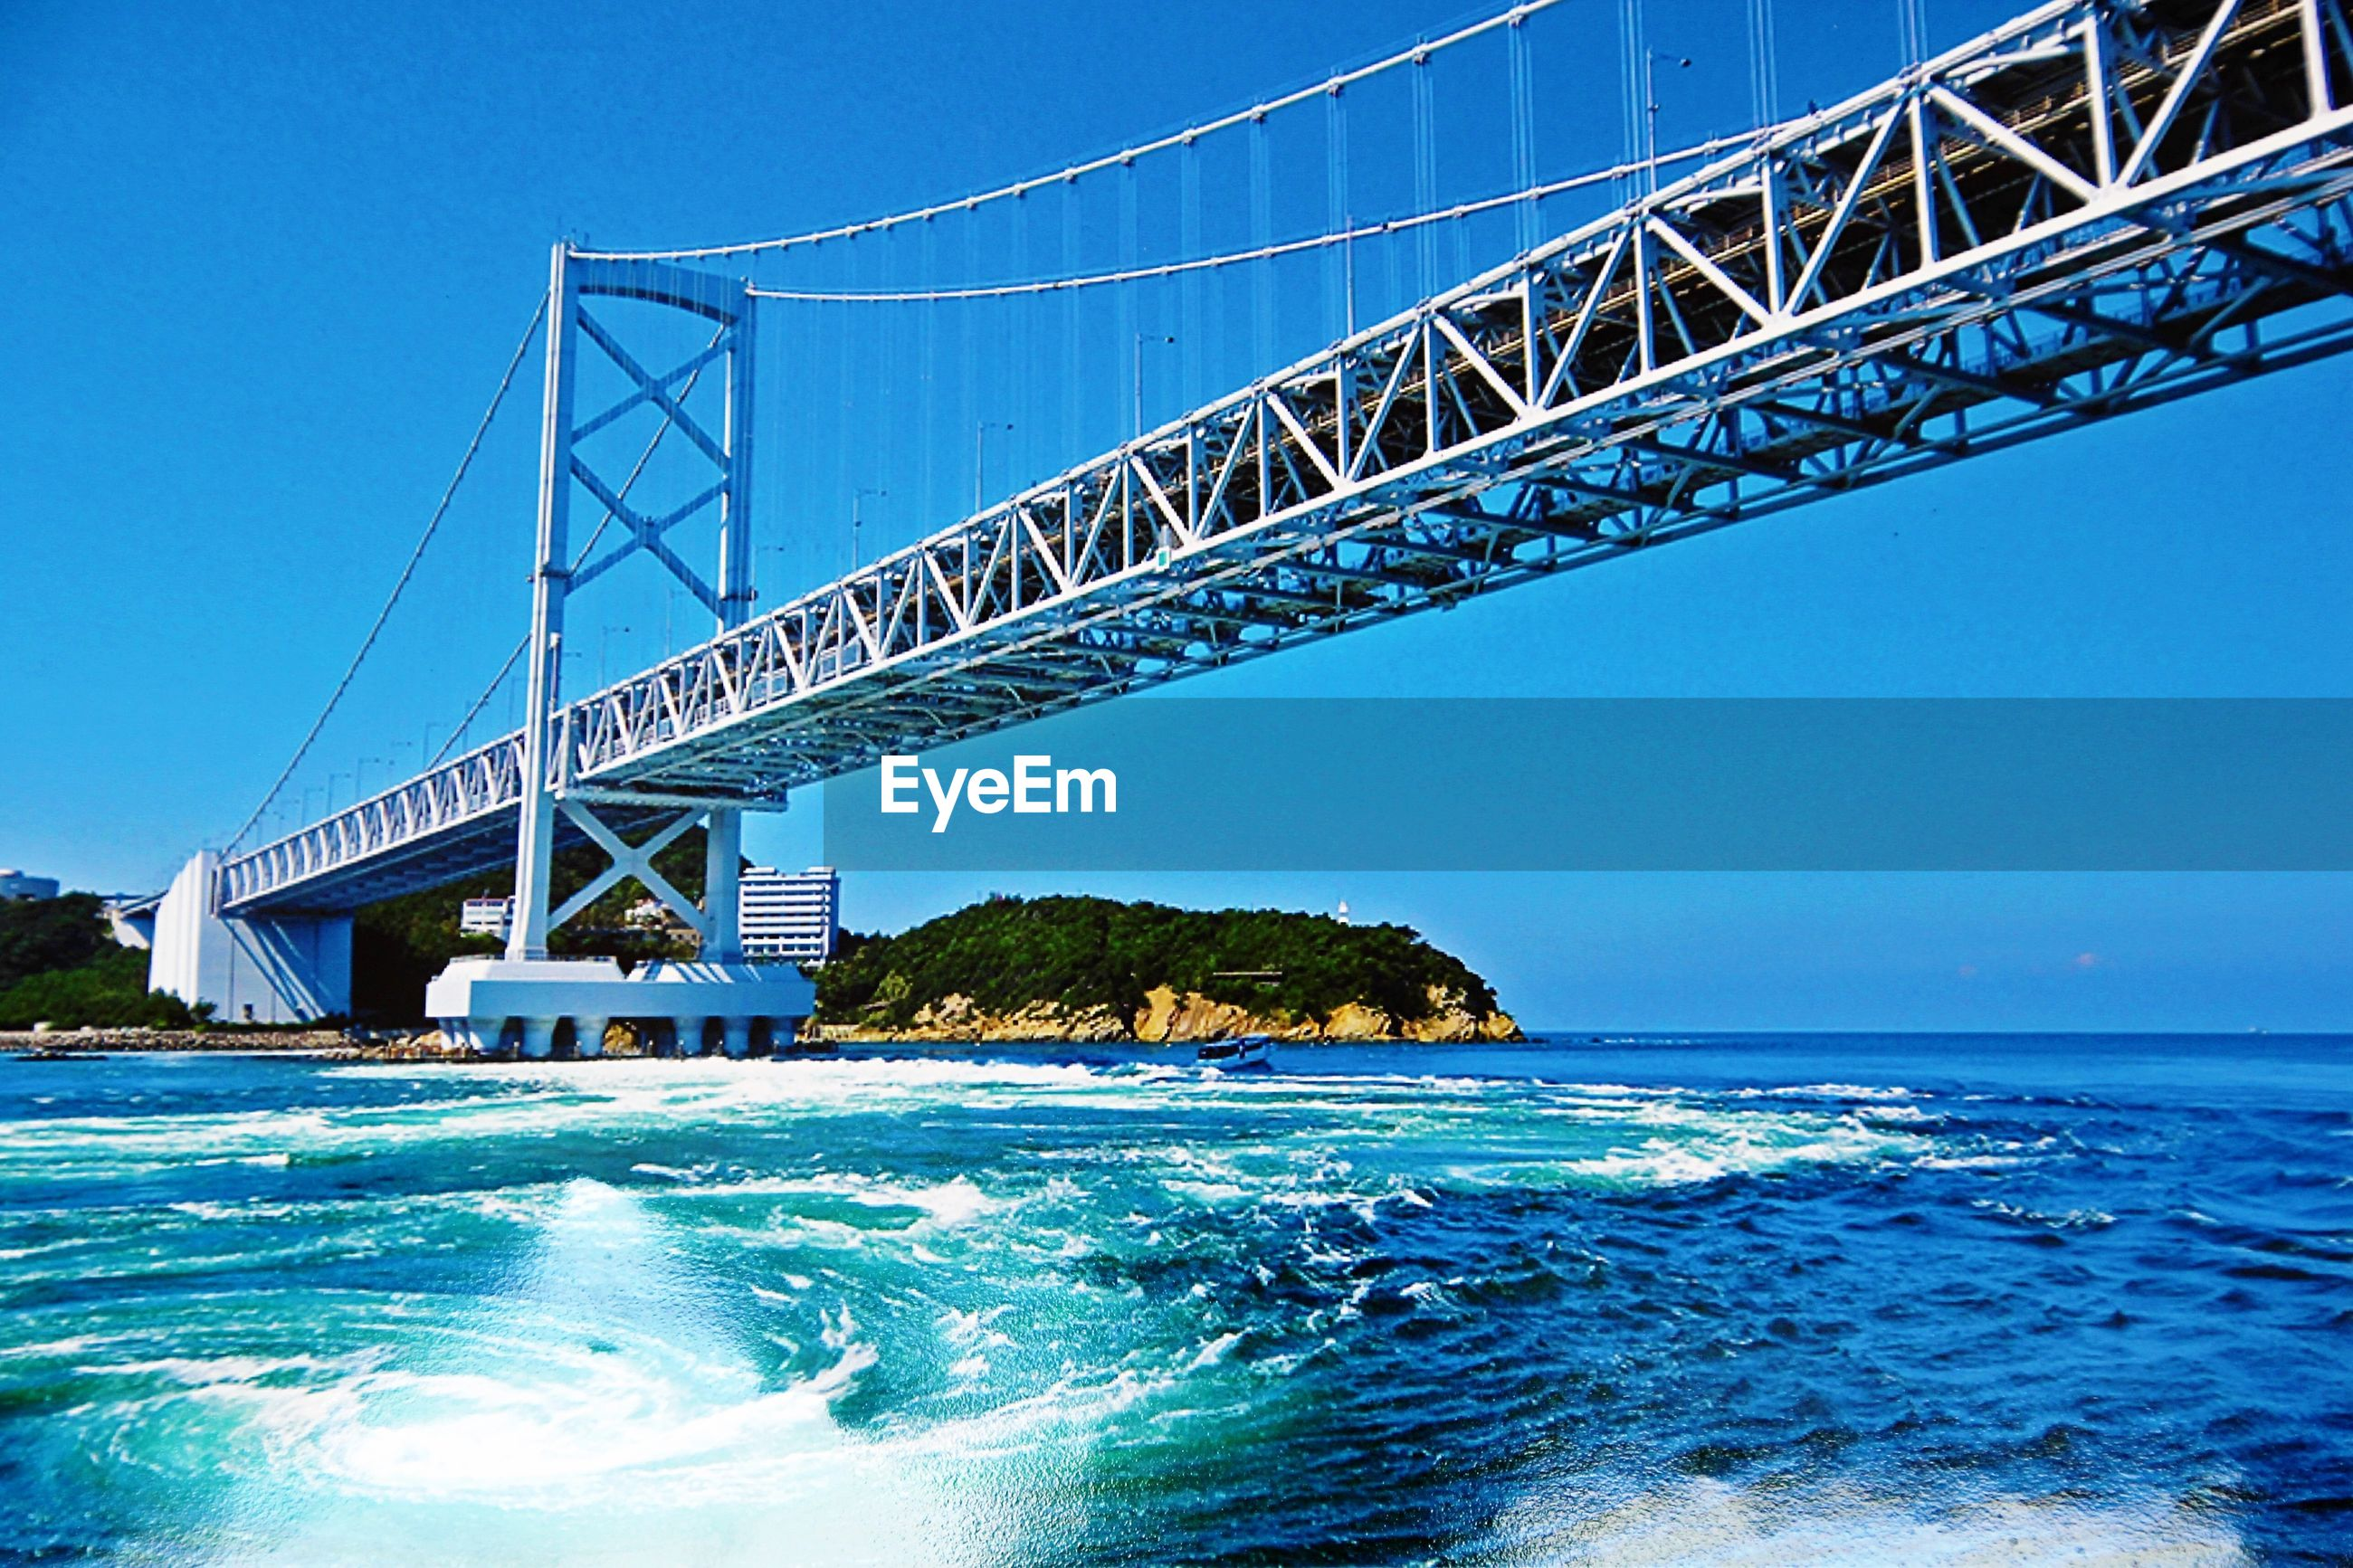 LOW ANGLE VIEW OF BRIDGE OVER CALM BLUE SEA